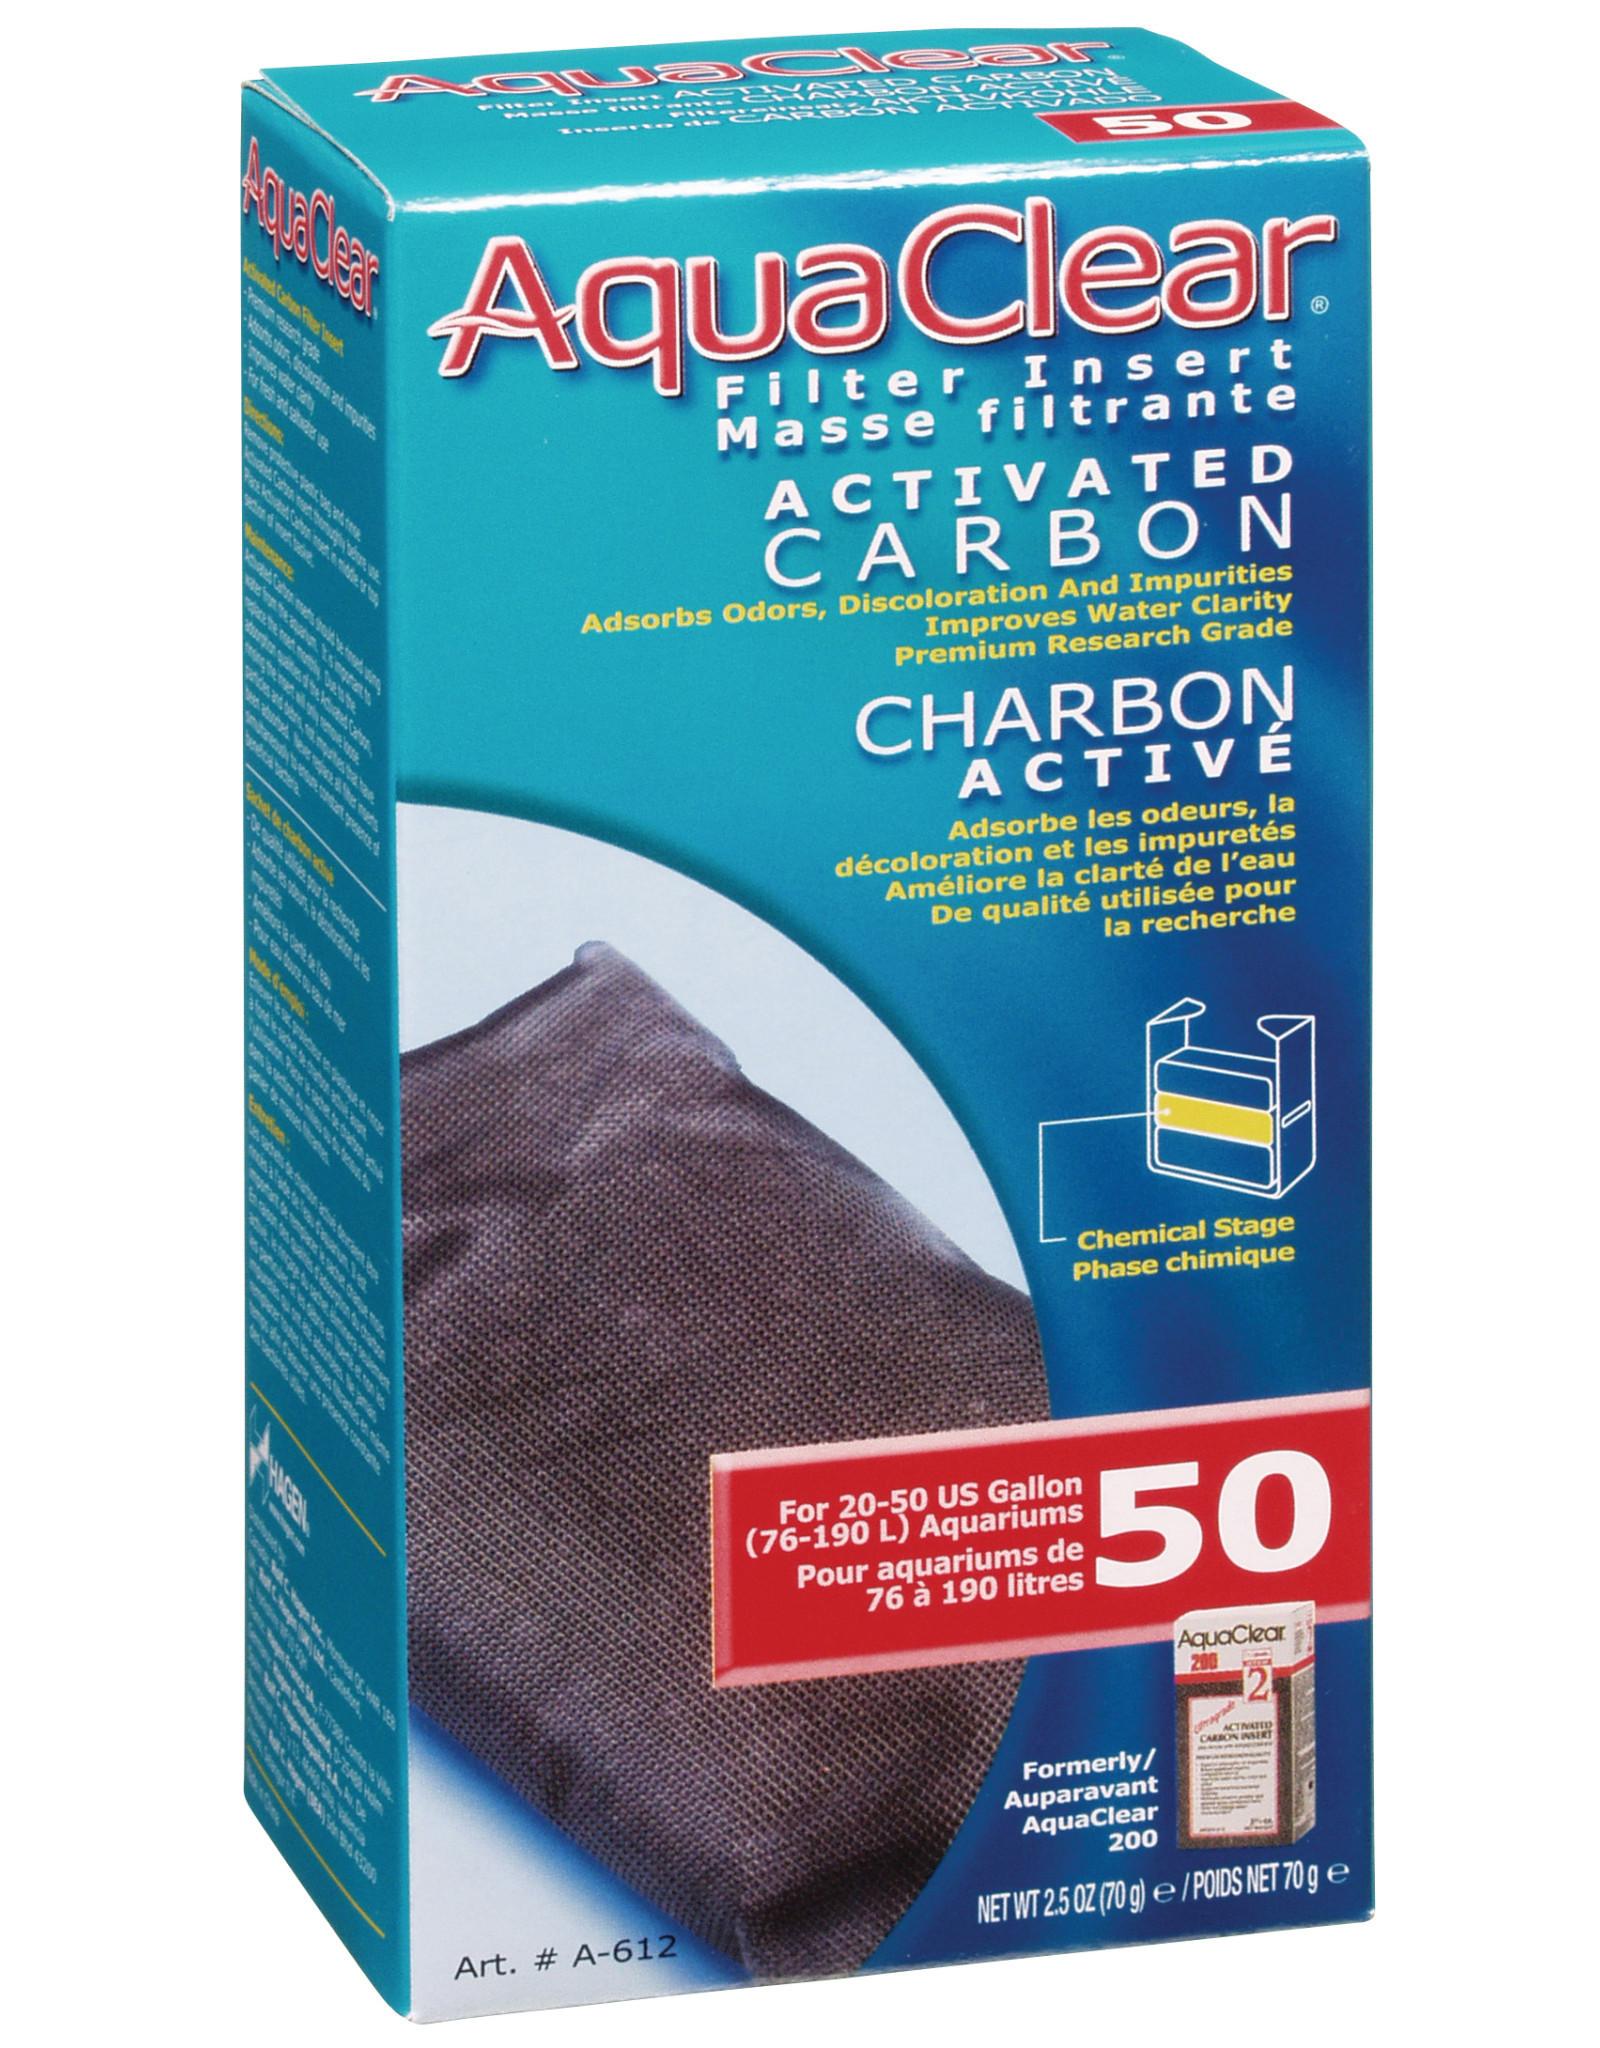 AQUA CLEAR AquaClear 50 Power Filter, cETLus Listed (Inc. A612, A613 & A1372)